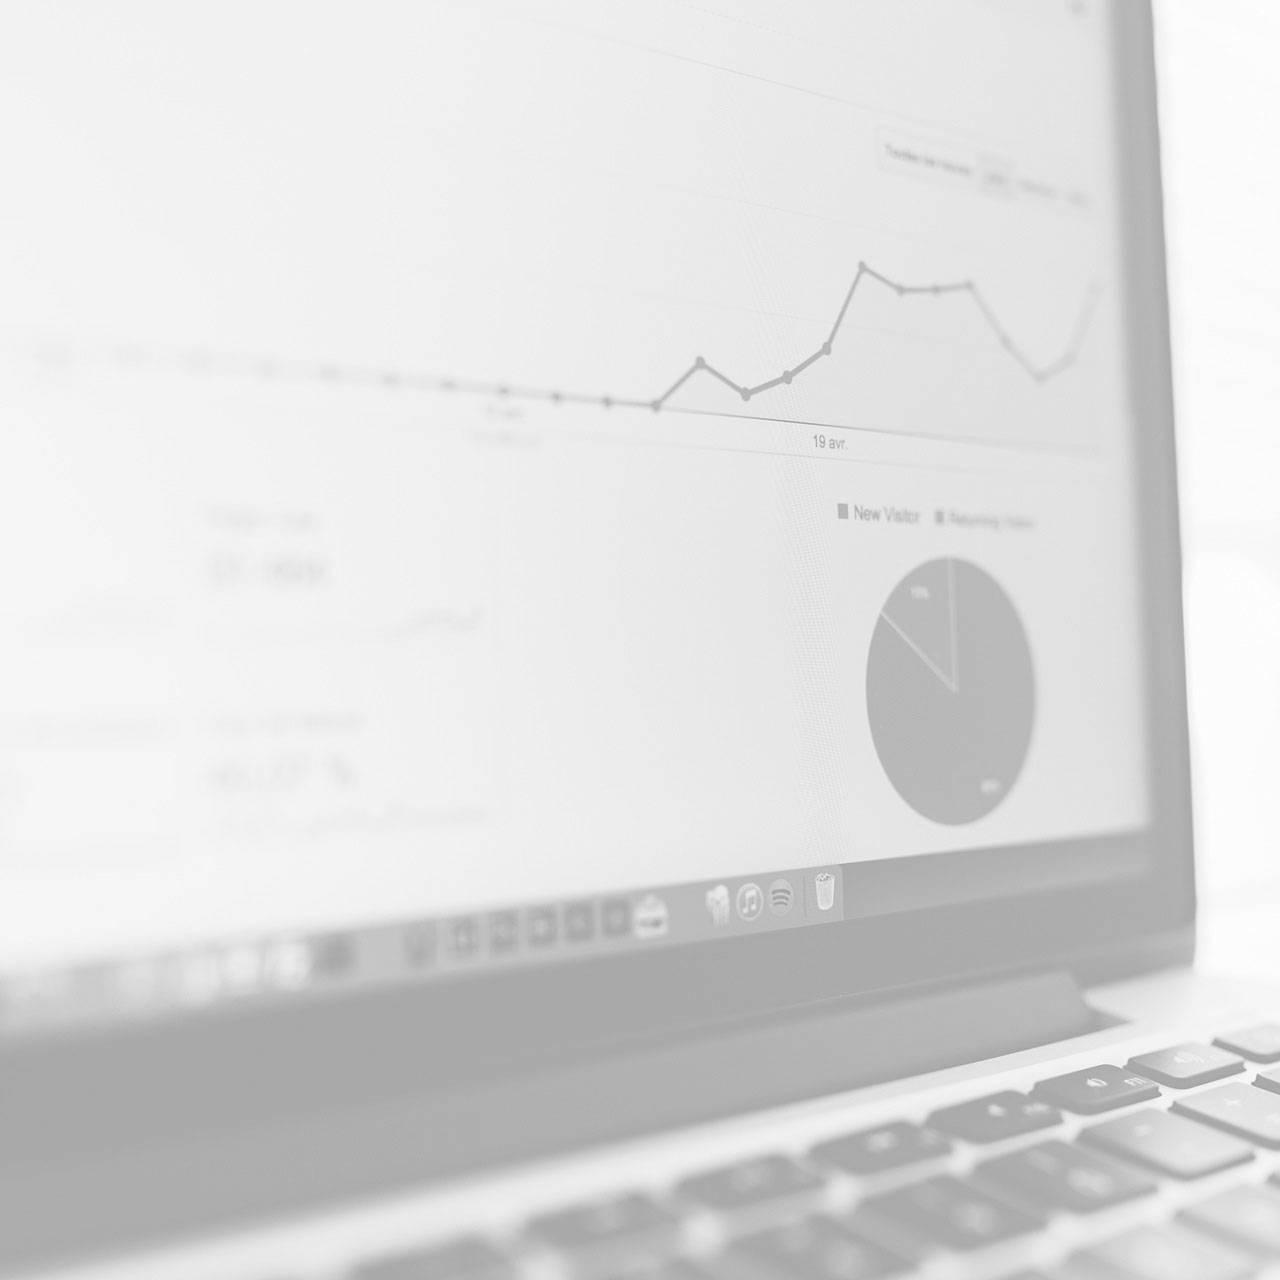 website seo analytics